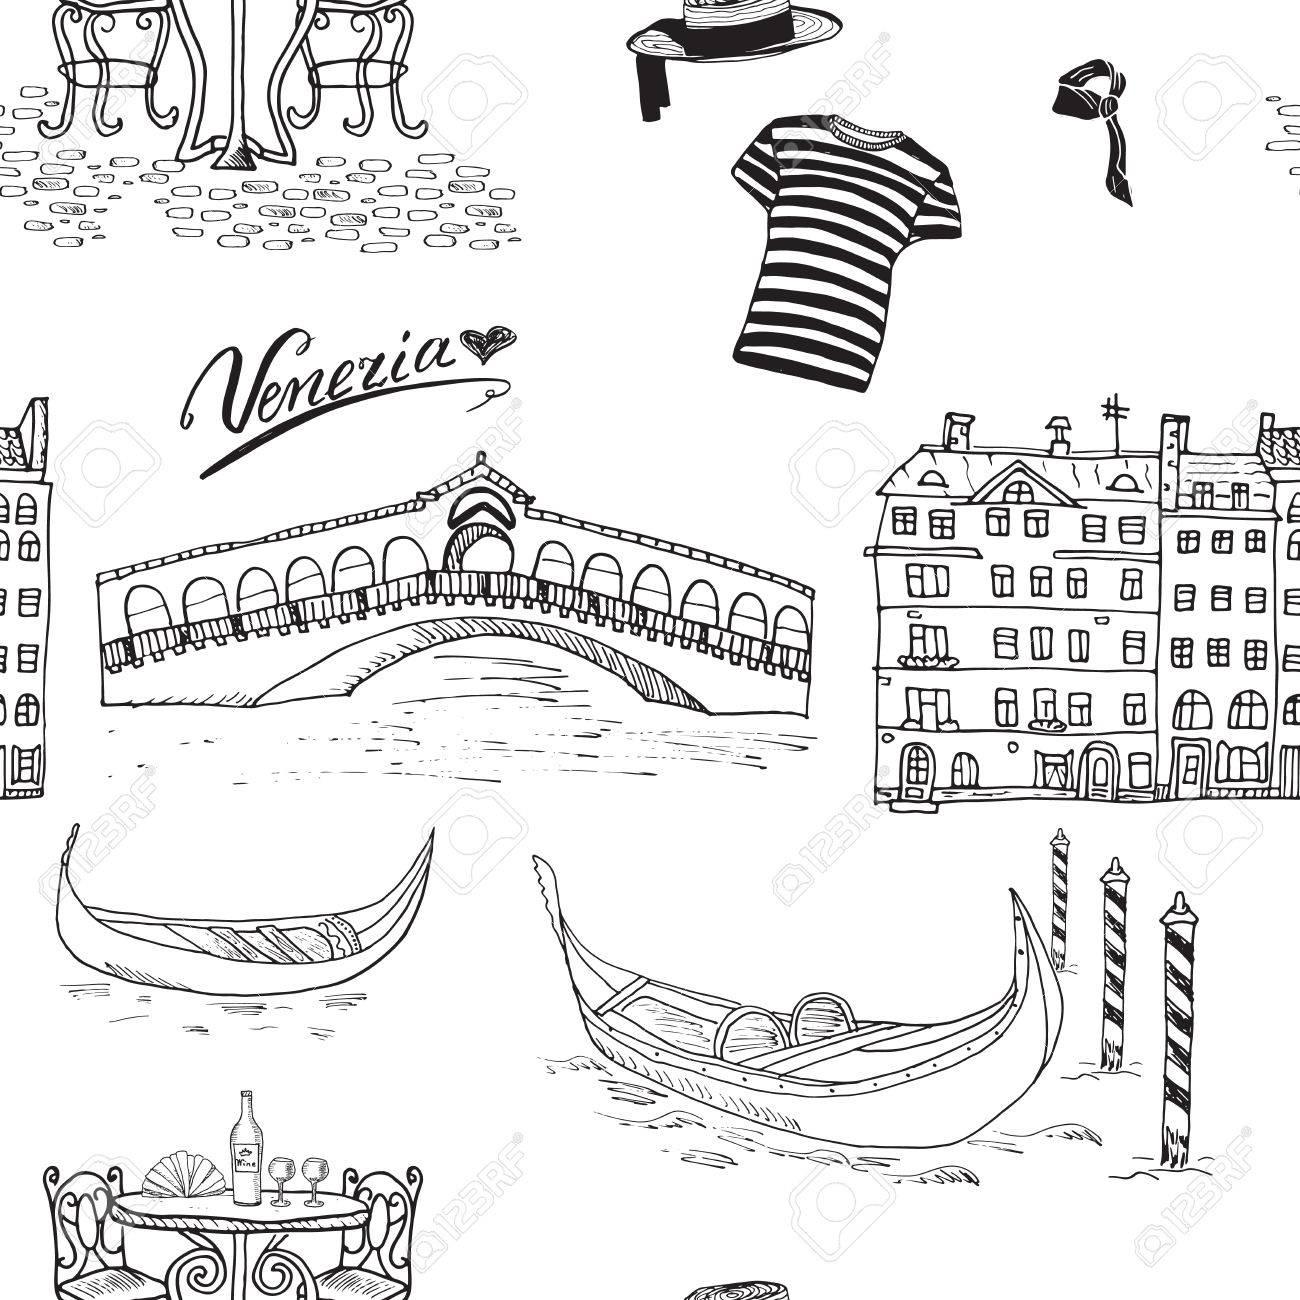 1300x1300 Venice Italy Seamless Pattern. Hand Drawn Sketch With Gondolas